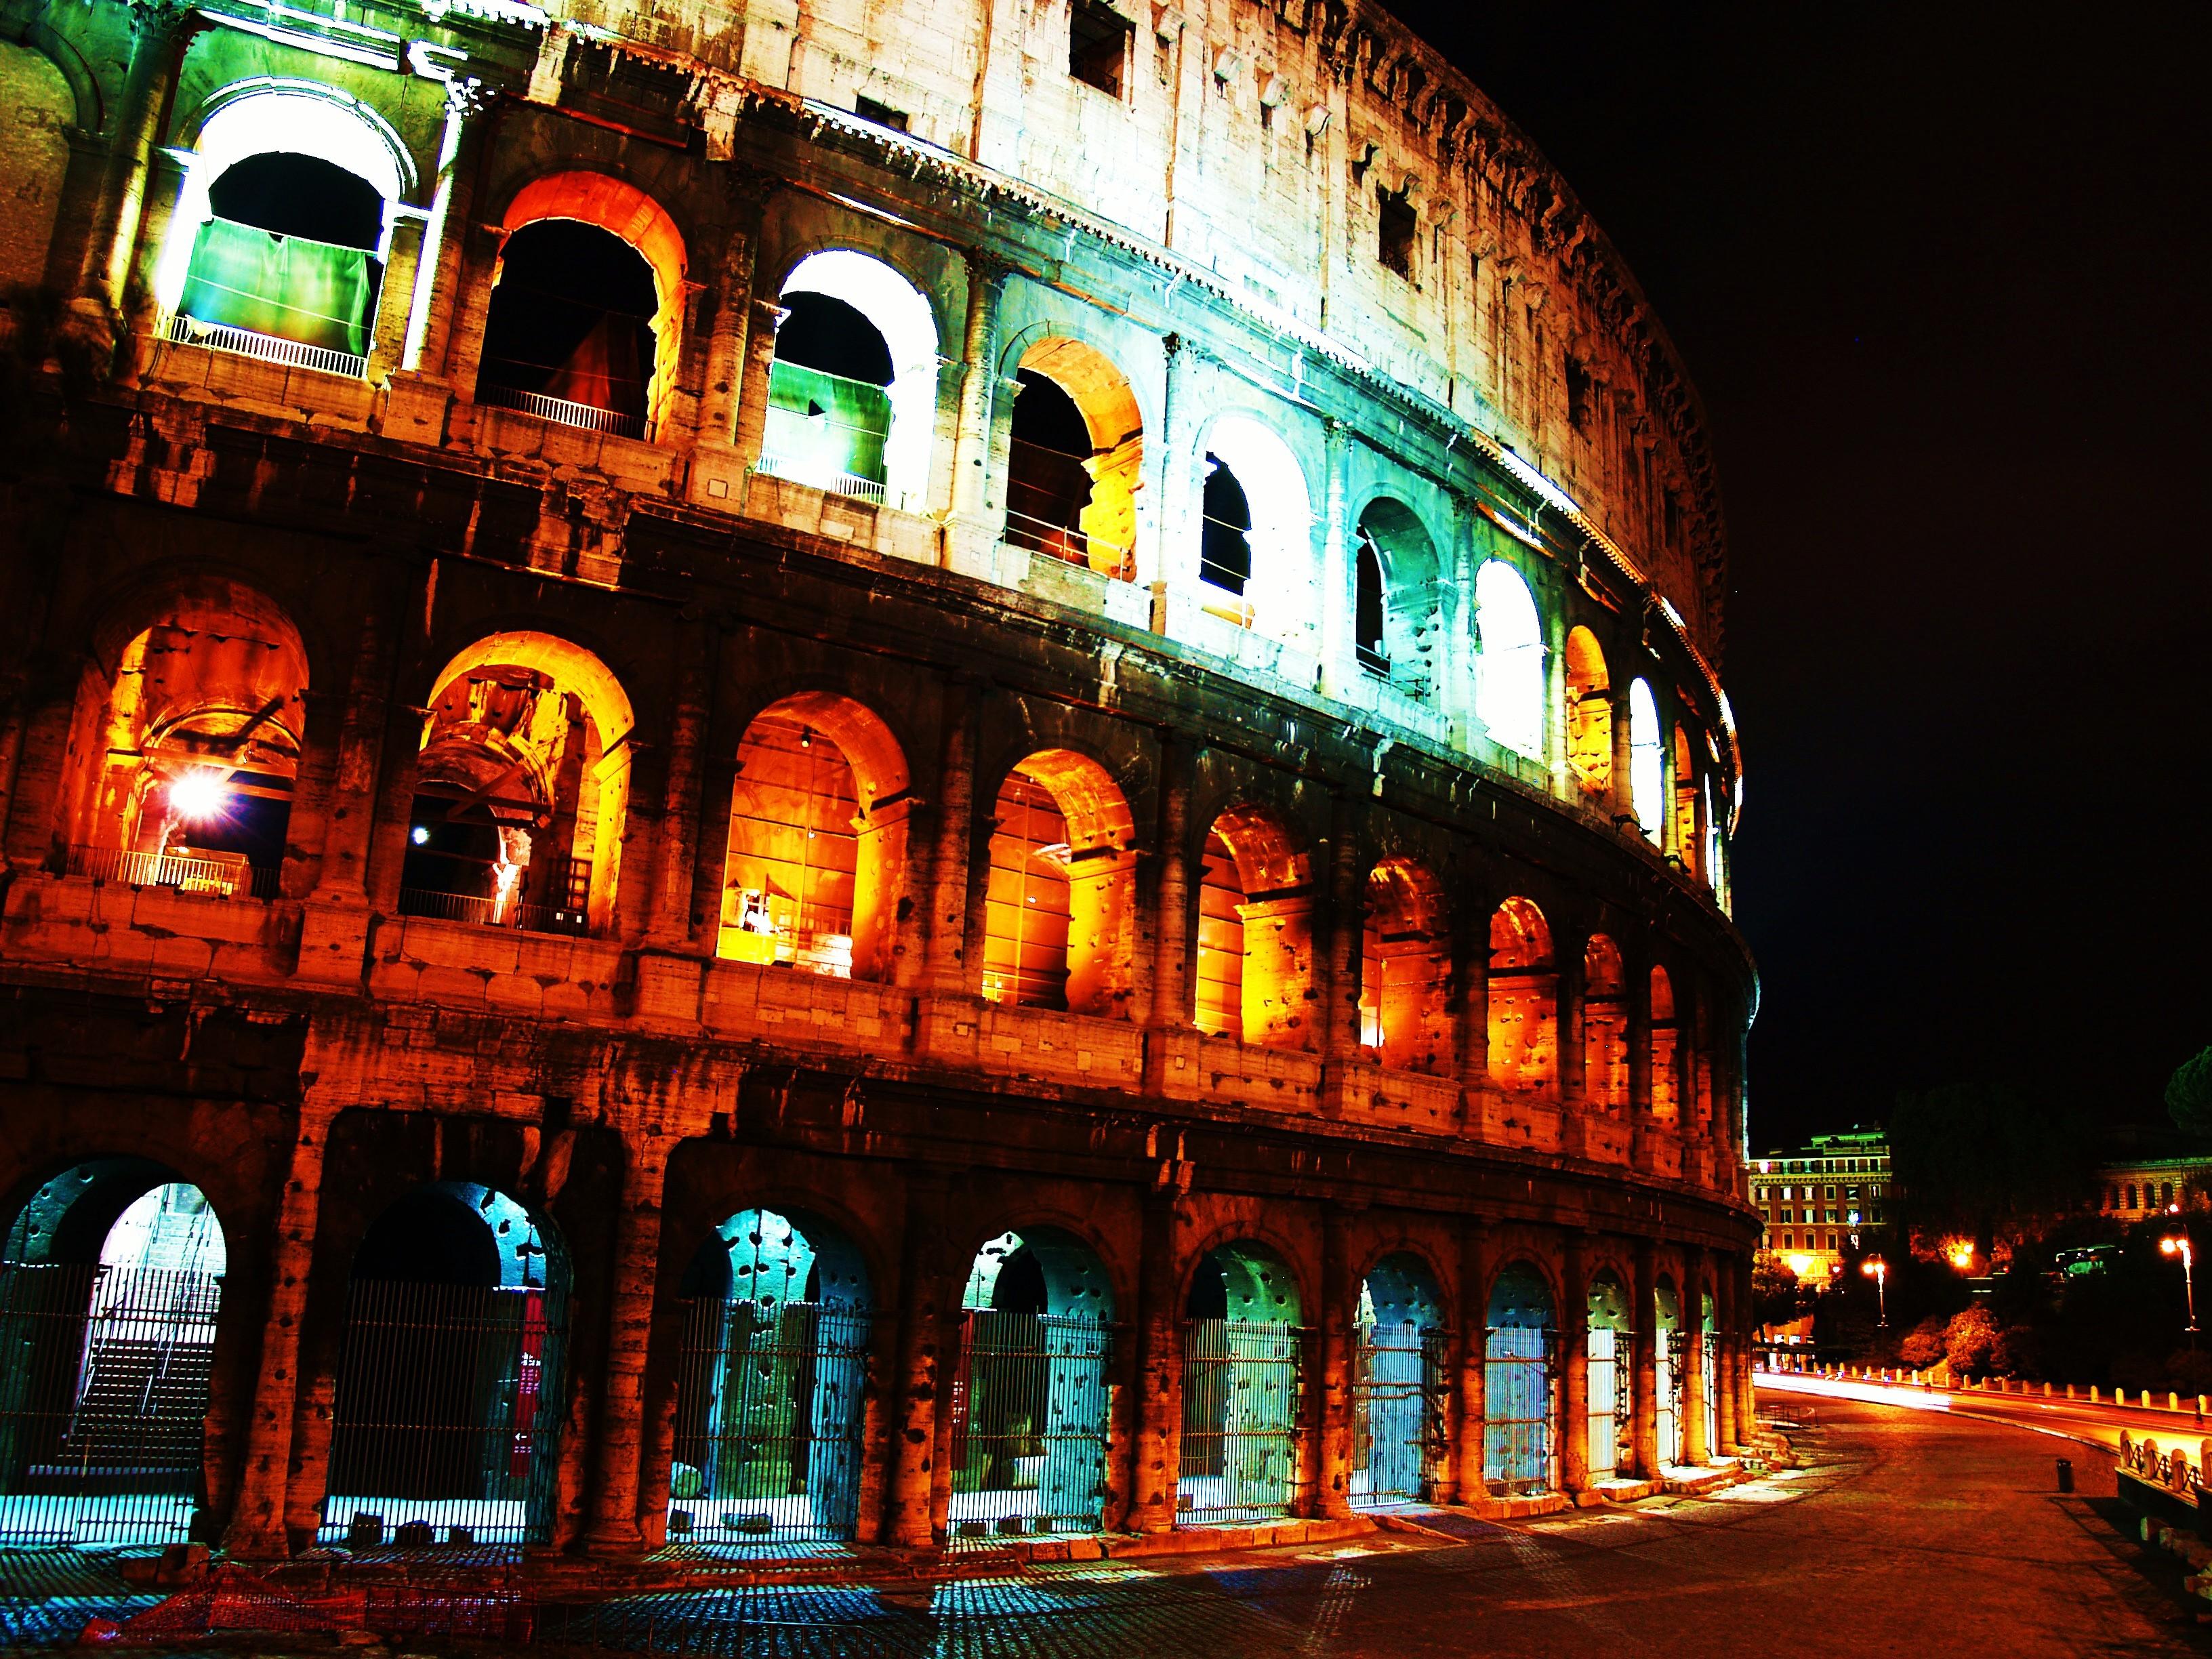 Good Wallpaper Night Colosseum - Roman_Coliseum  HD.JPG